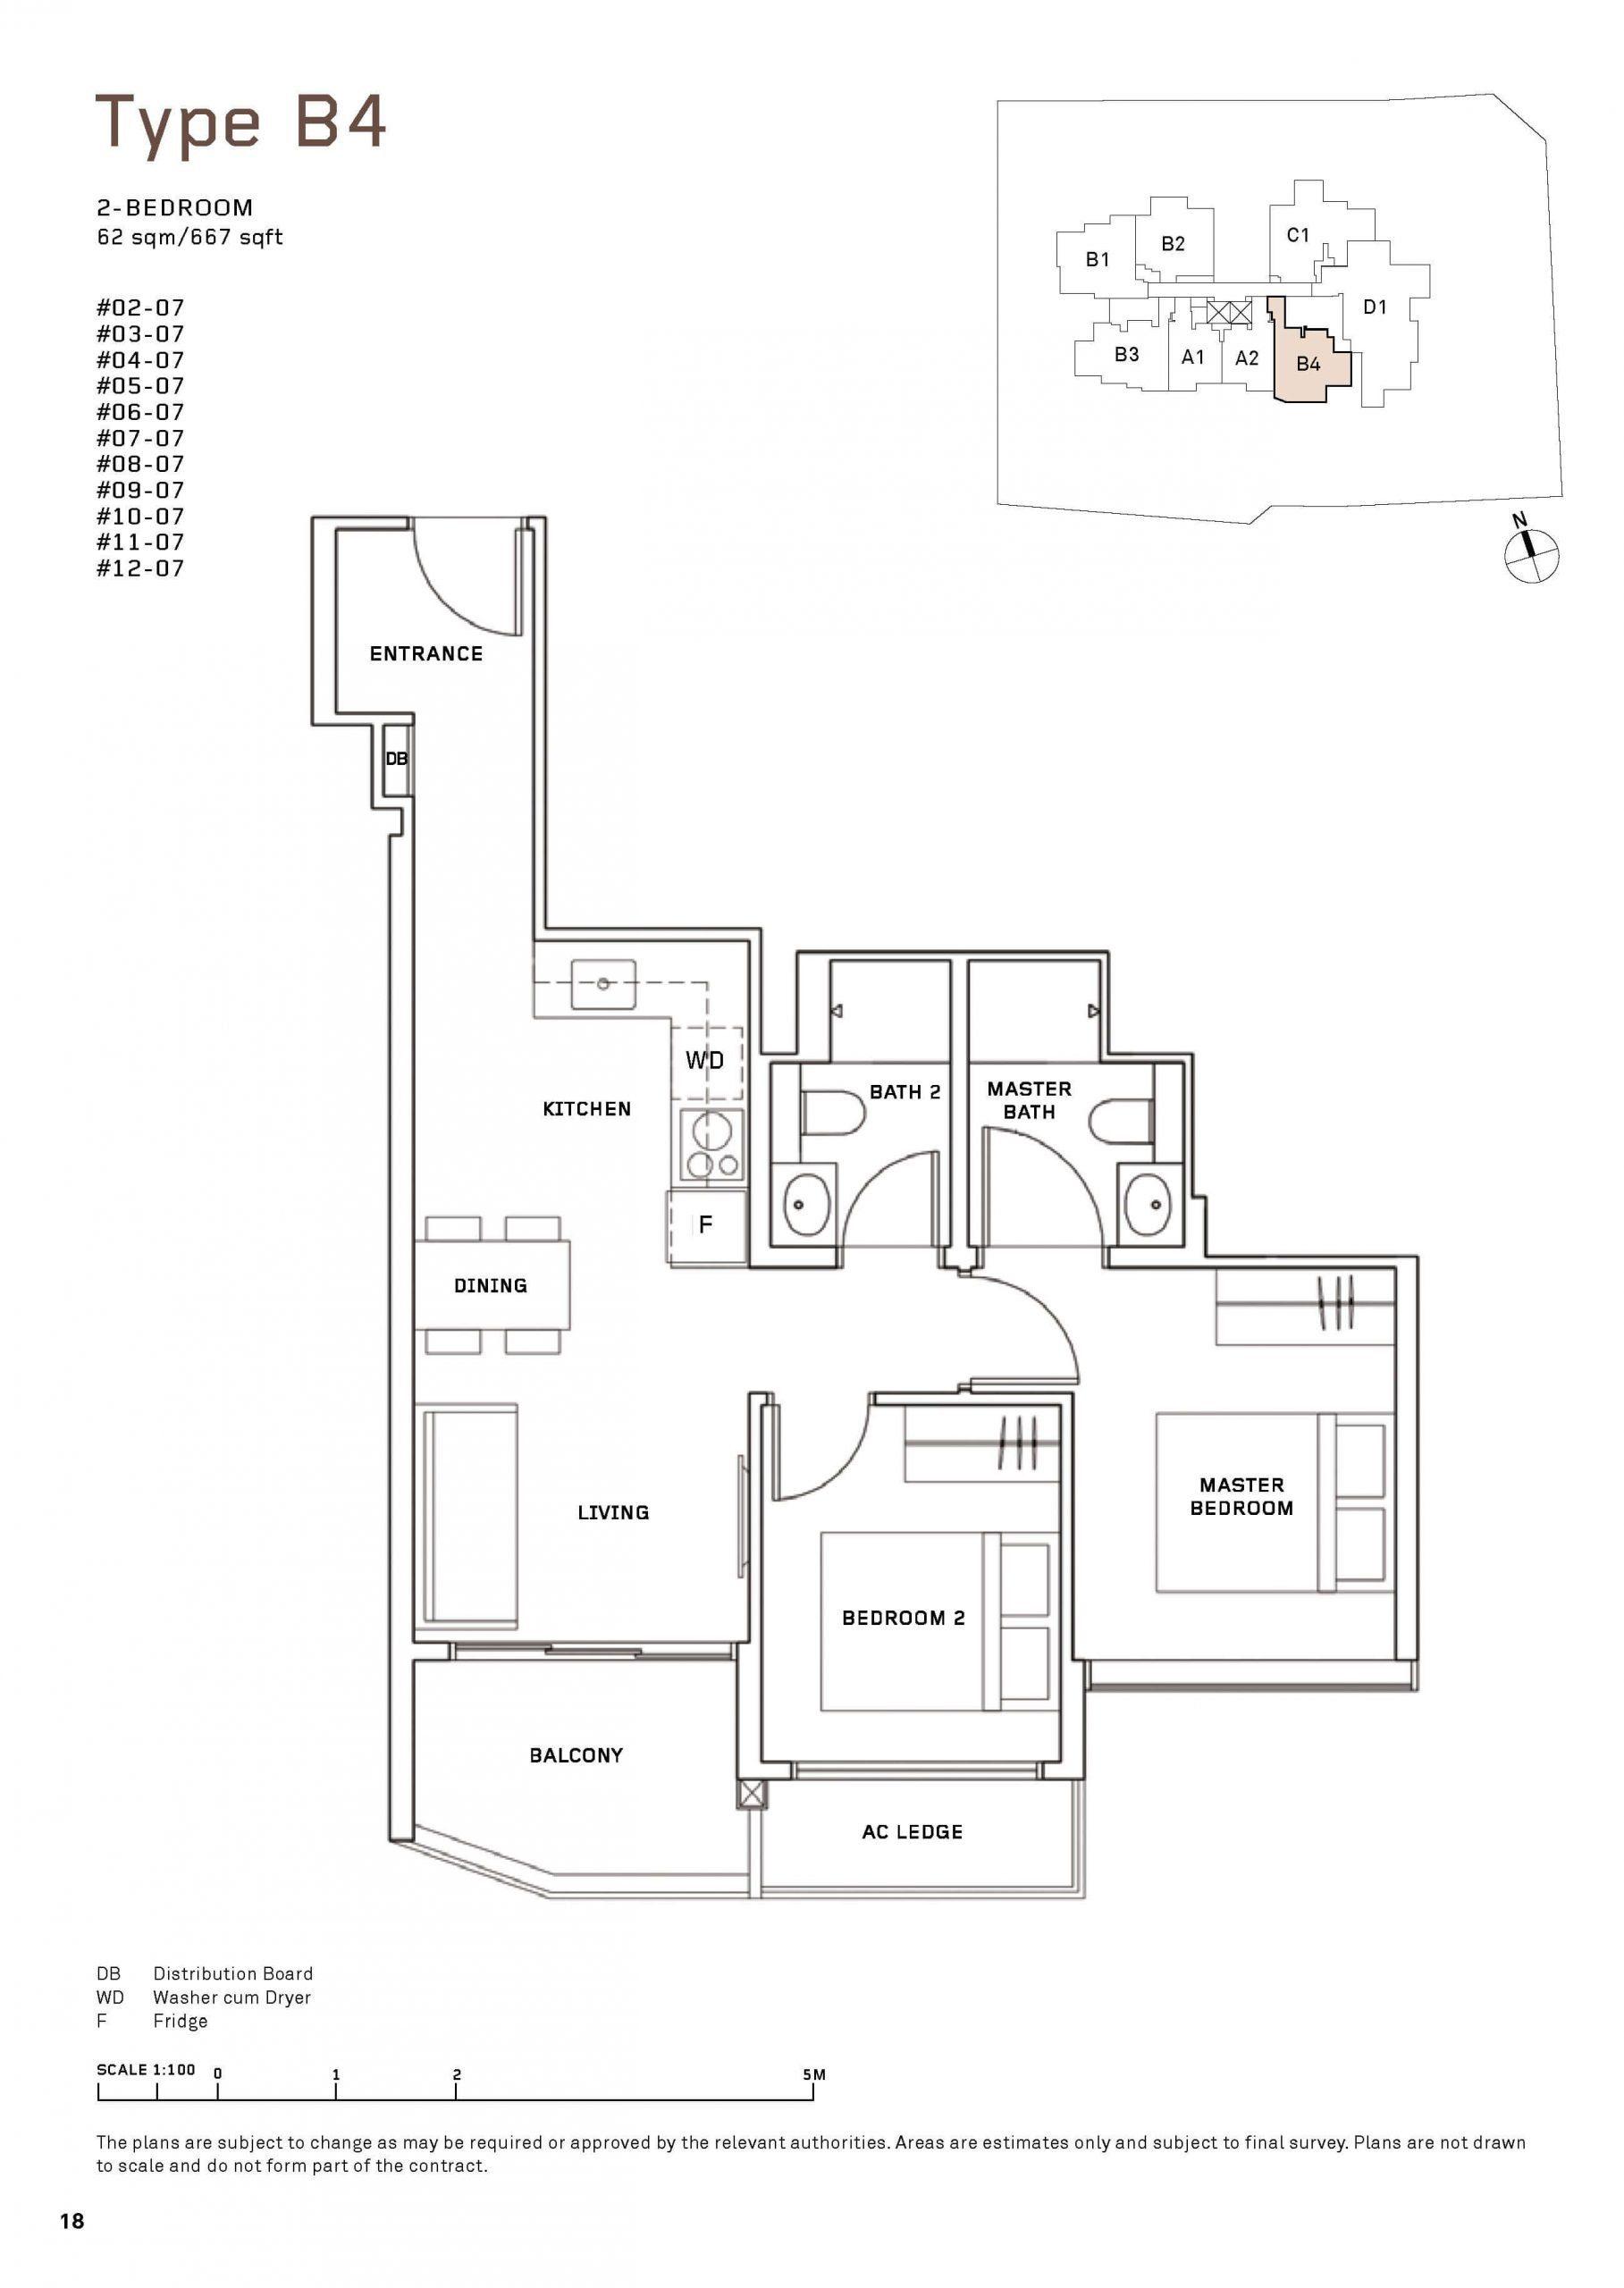 MYRA Condo Floor Plan 2 Bedroom 5 scaled